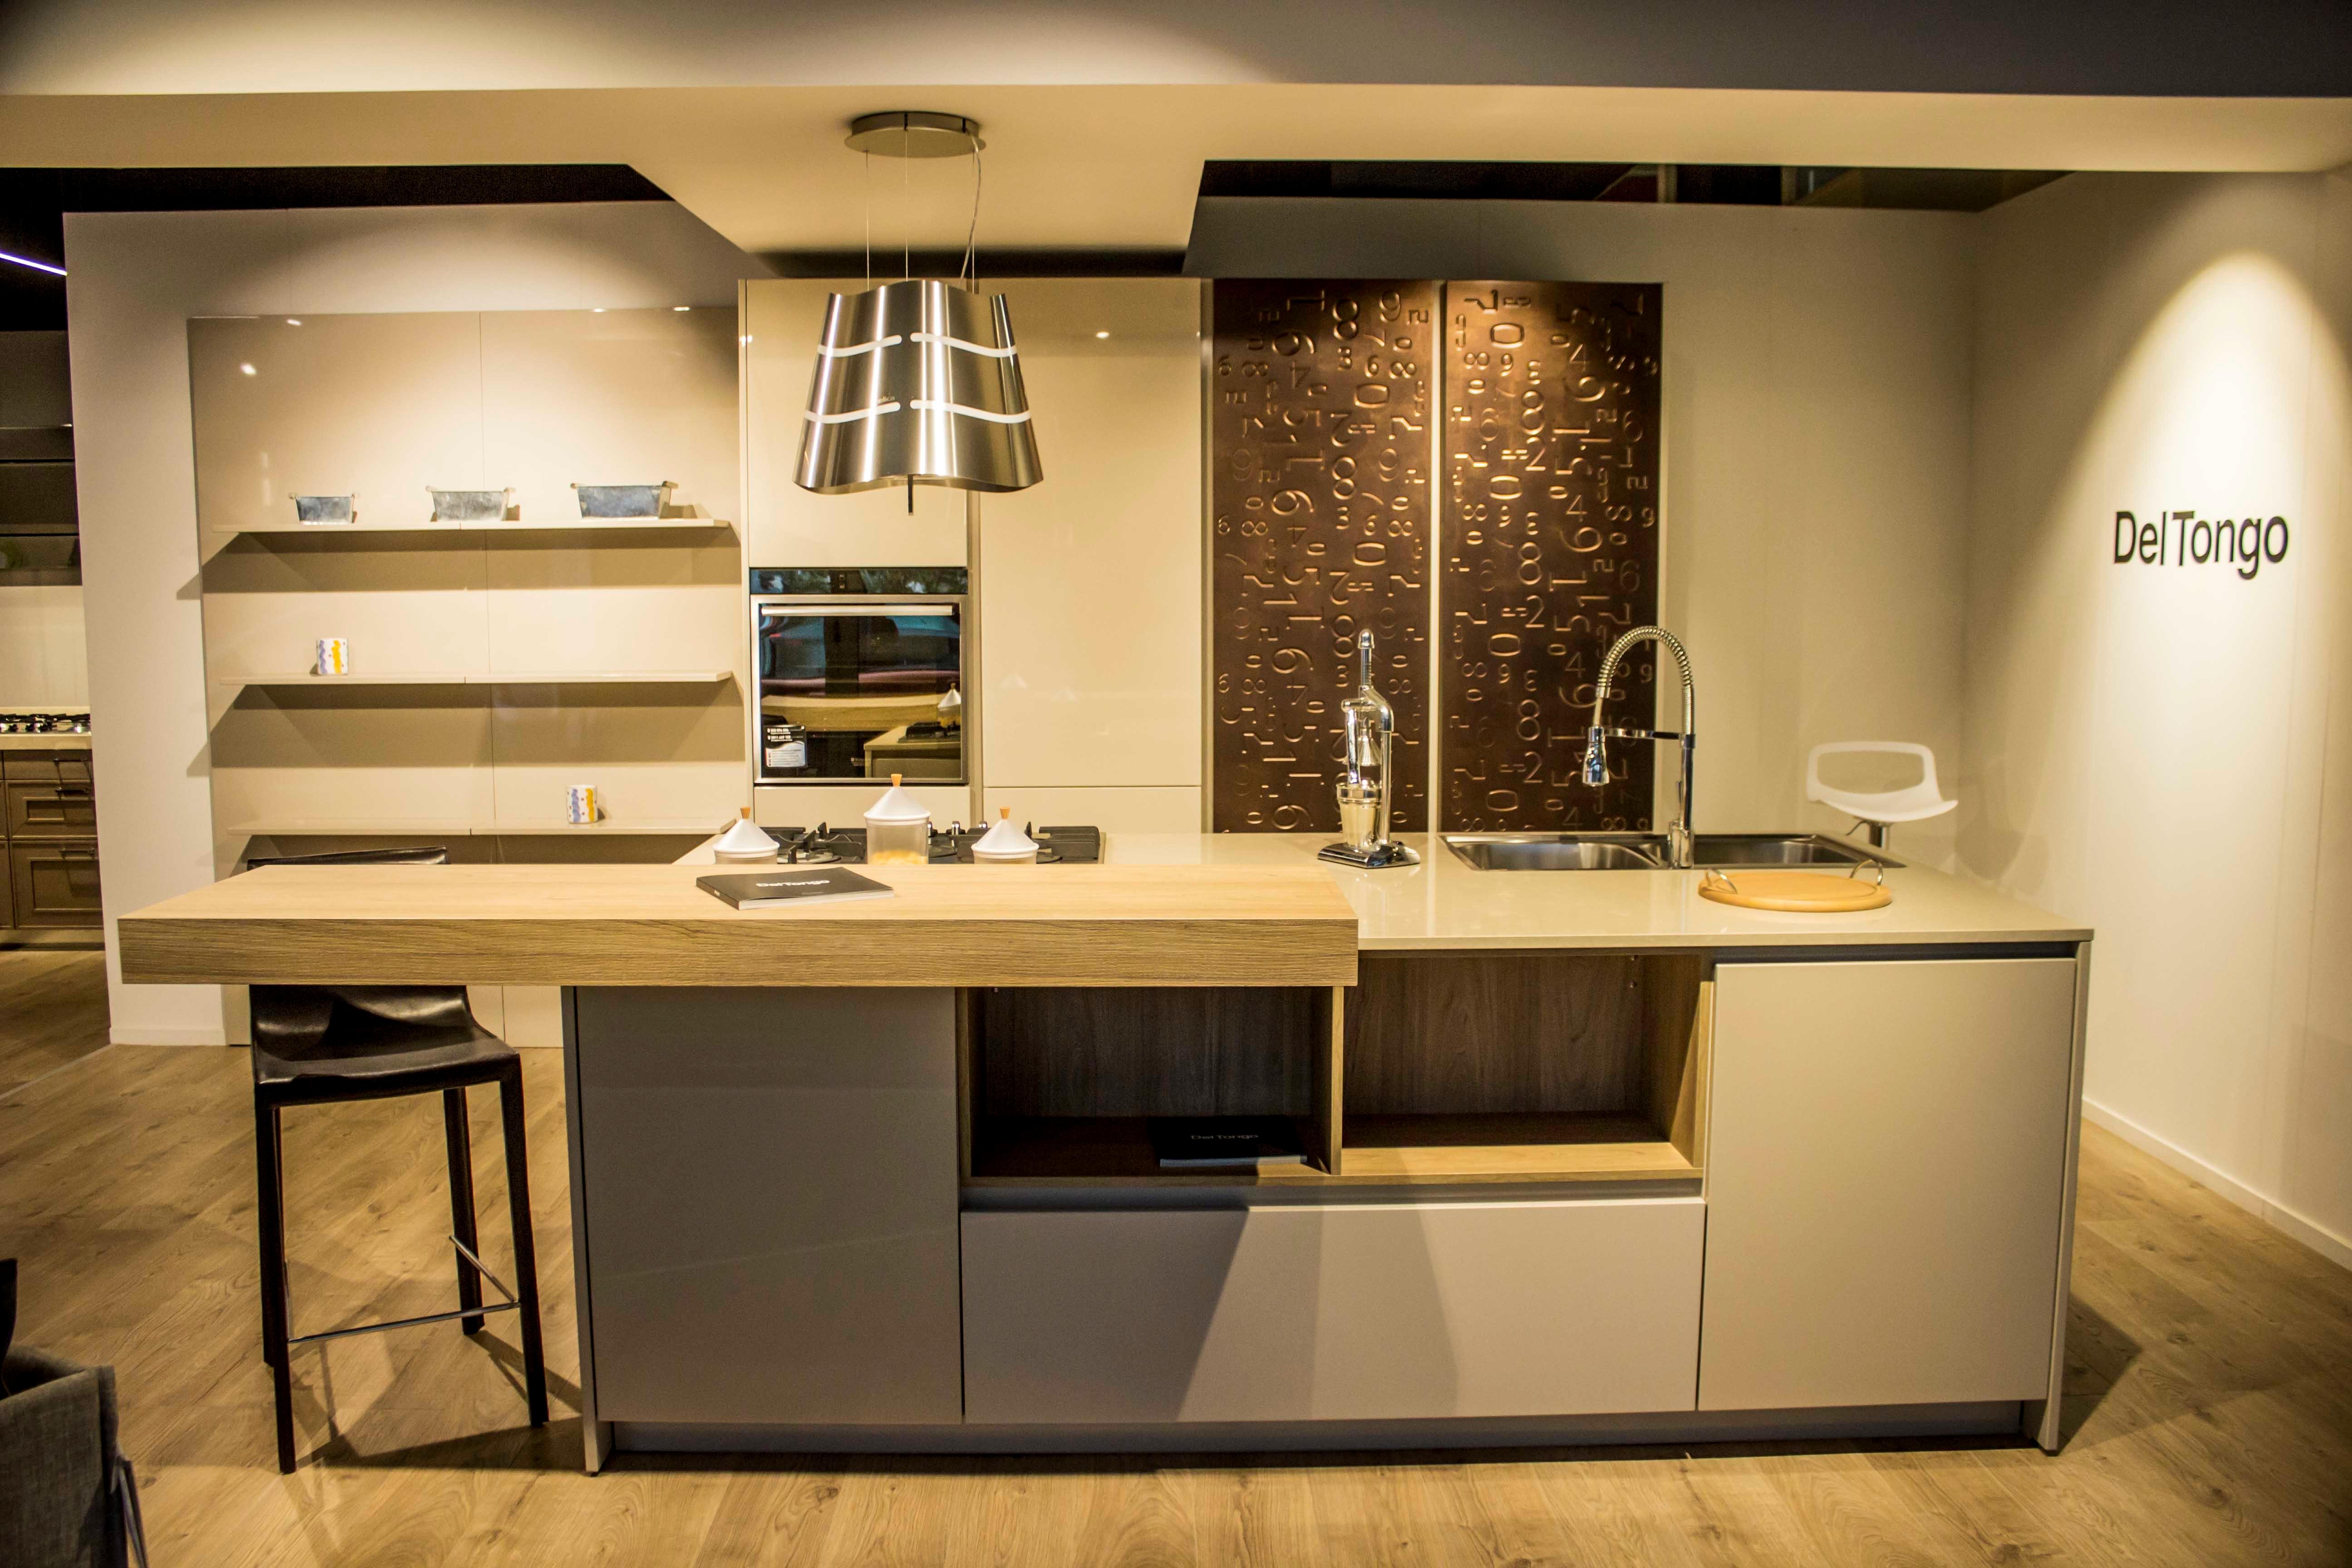 Cucina Del Tongo Creta] - 29 images - cucine con isola modello creta ...